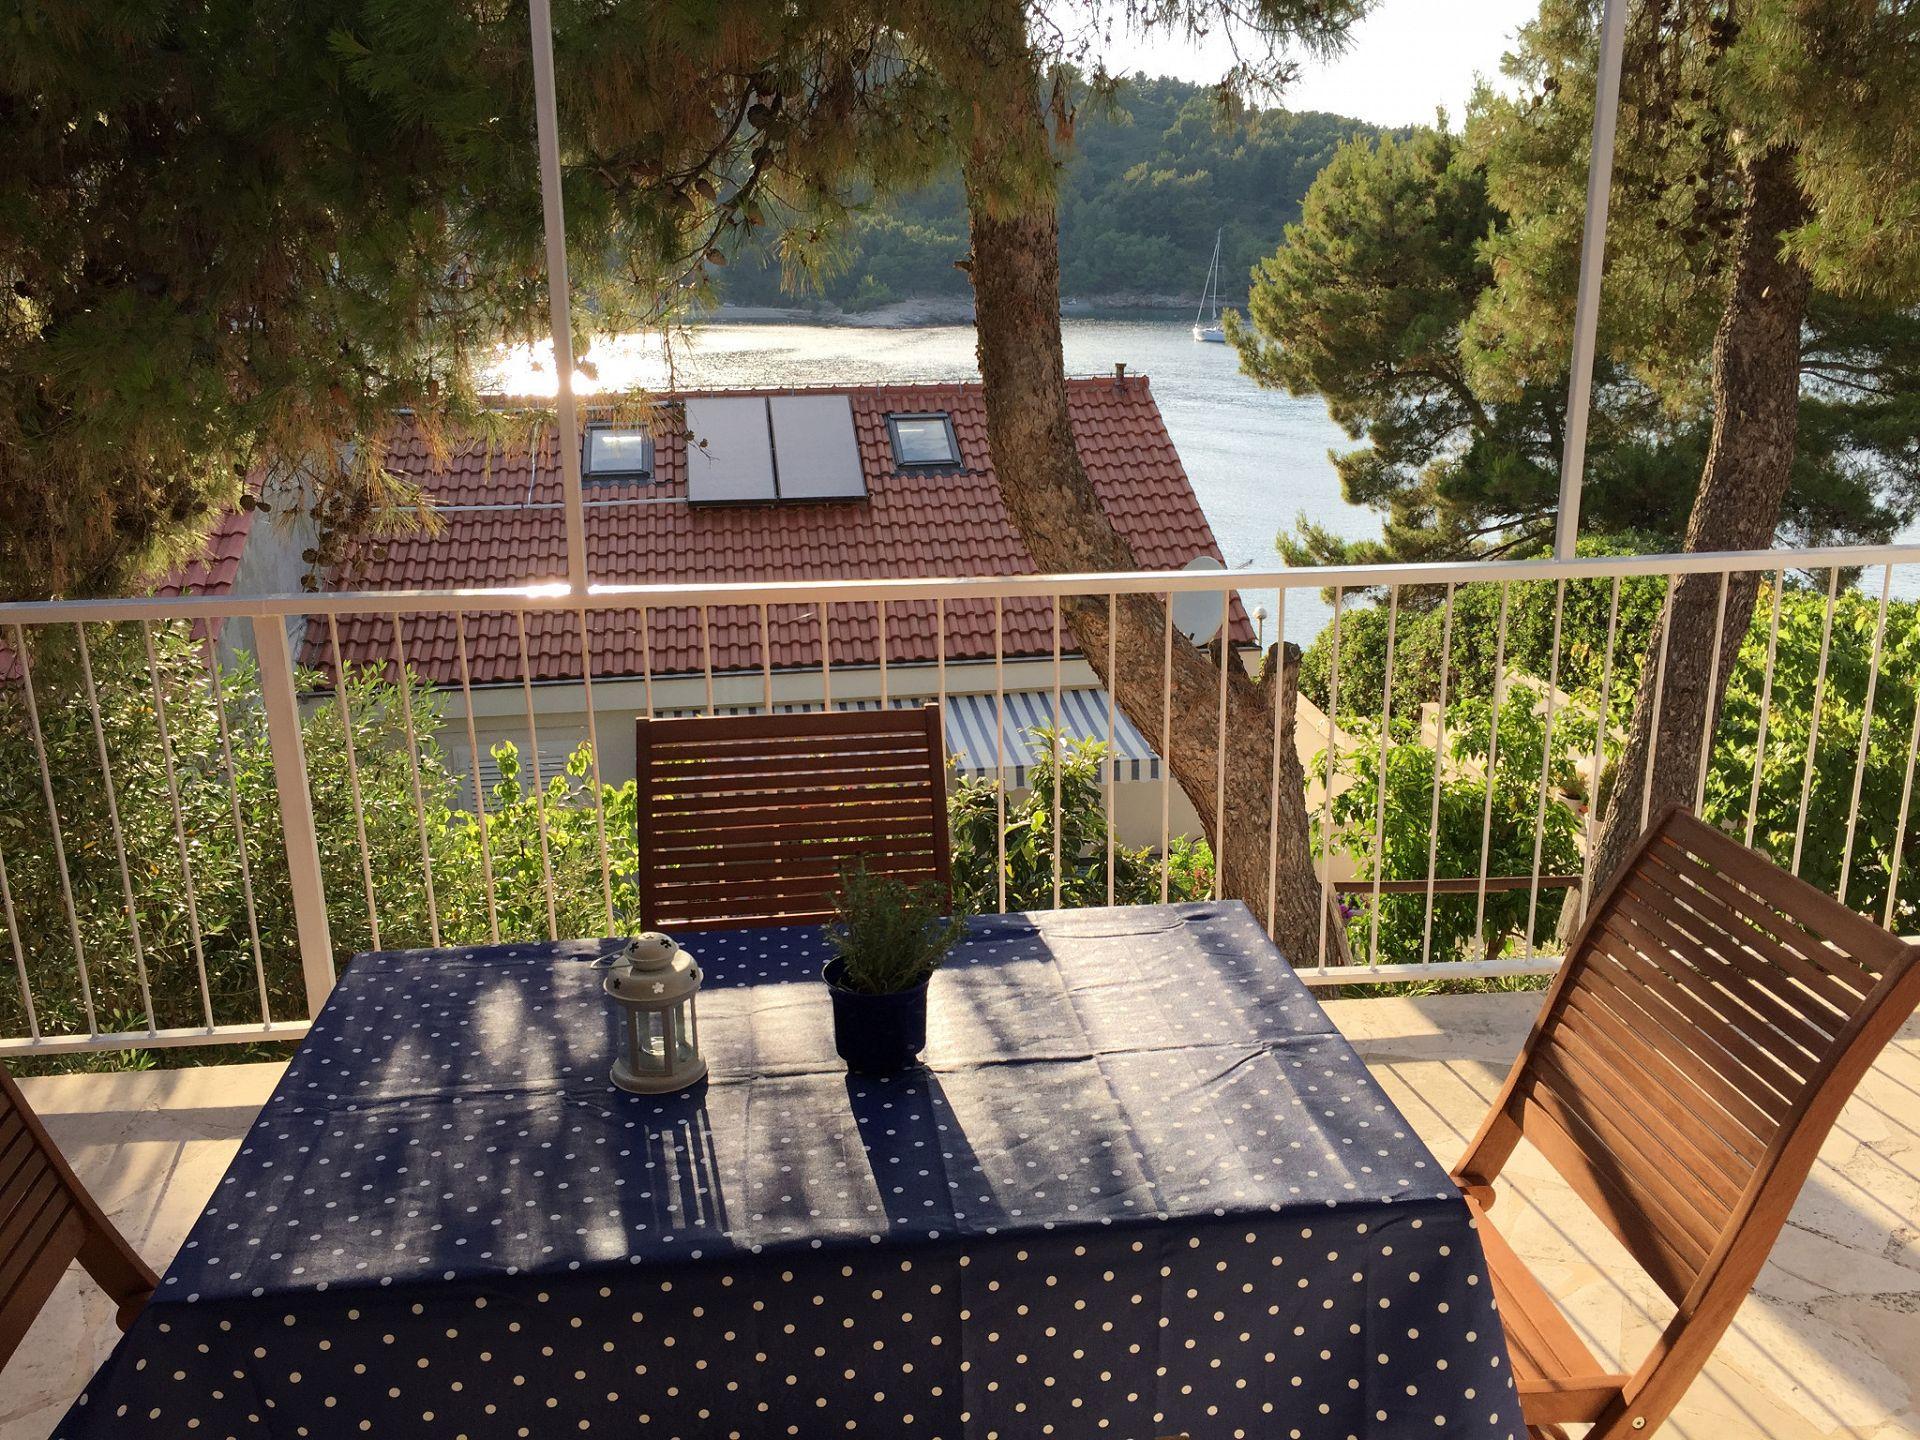 Holiday Homes, Stomorska, Island of Šolta - Holiday houses, villas  Vanesa - 50m from the sea: